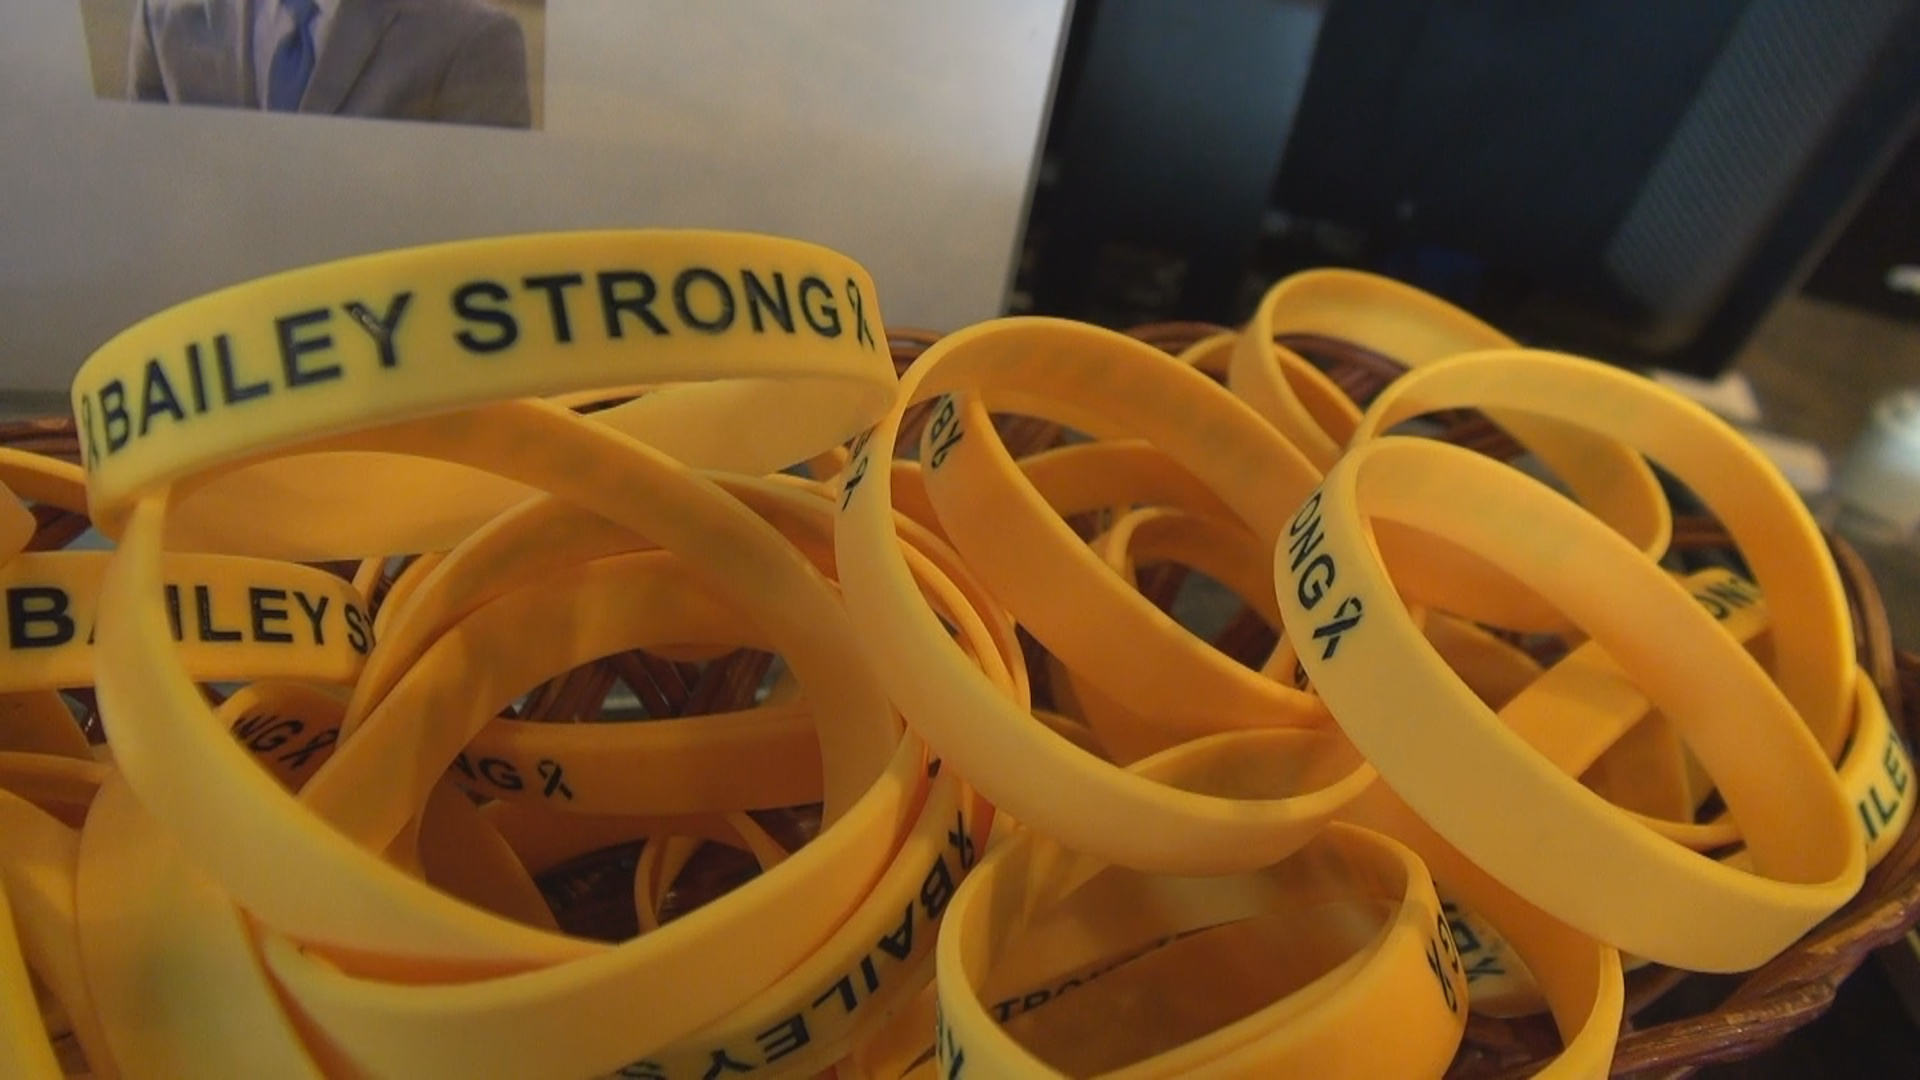 bailey strong_1529440540815.jpg.jpg